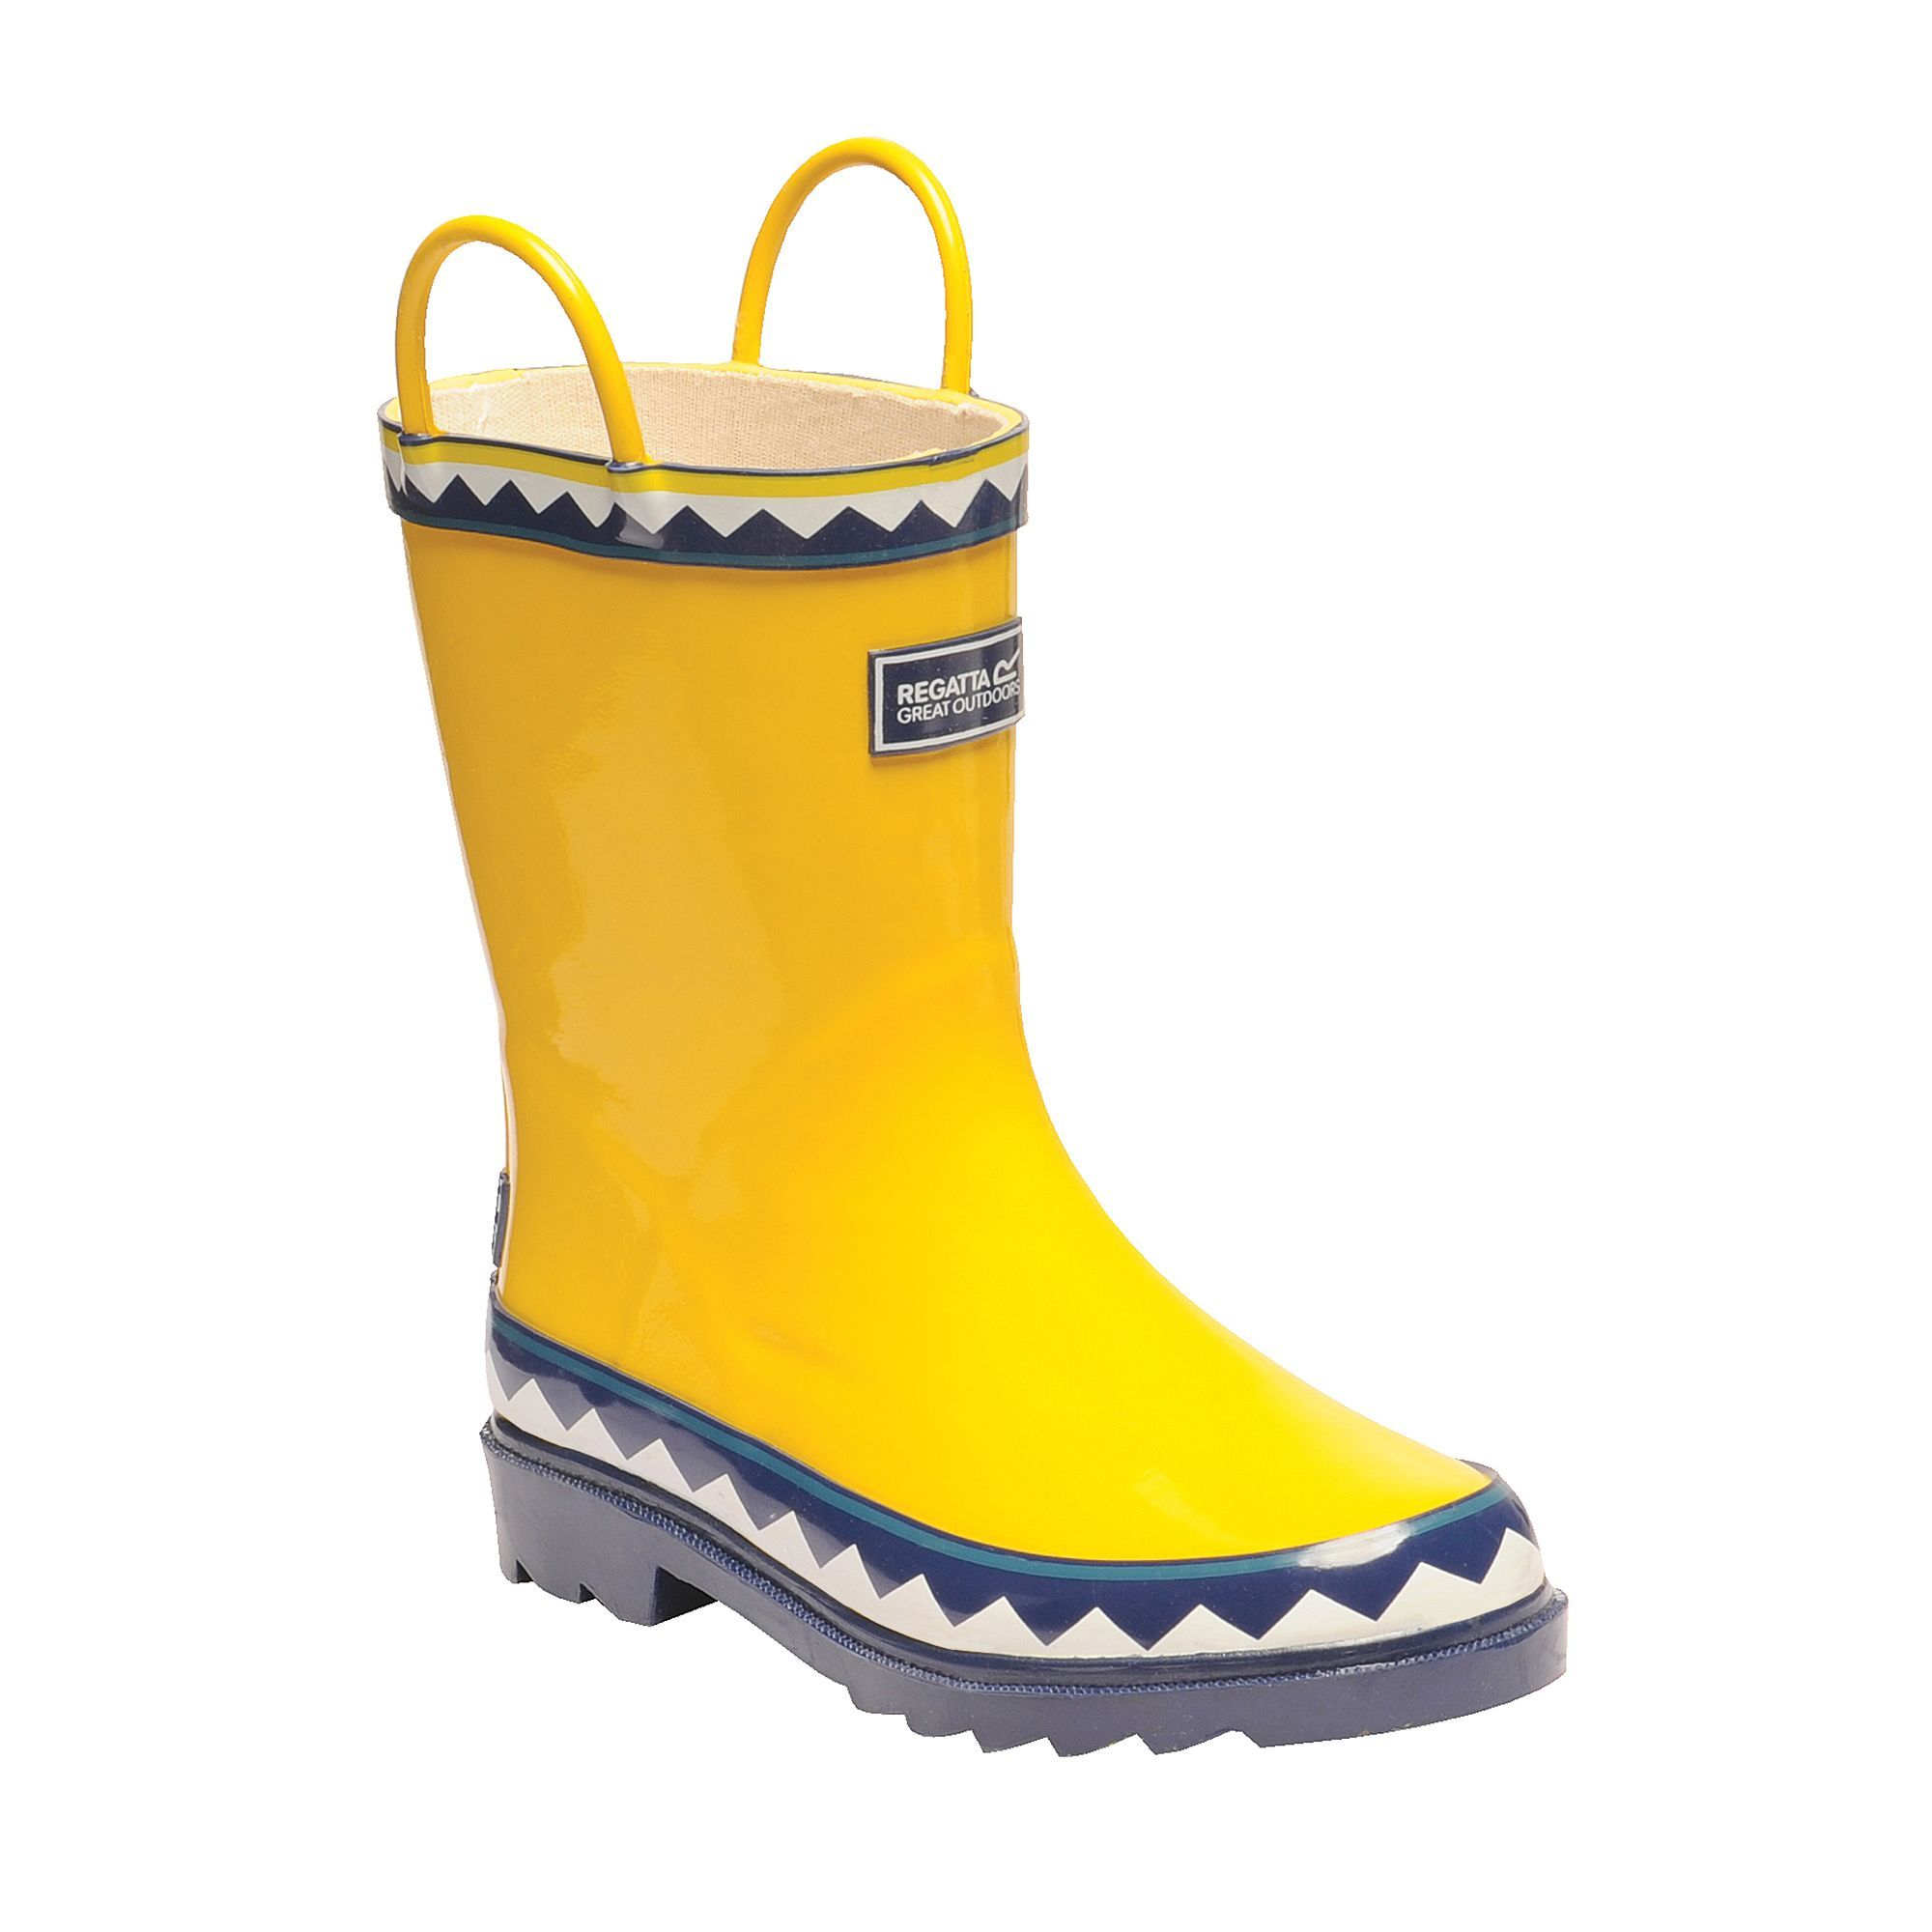 Regatta Great Outdoors Childrens/Kids Minnow Patterned Wellington Boots (Unicorn/Red Ochre)